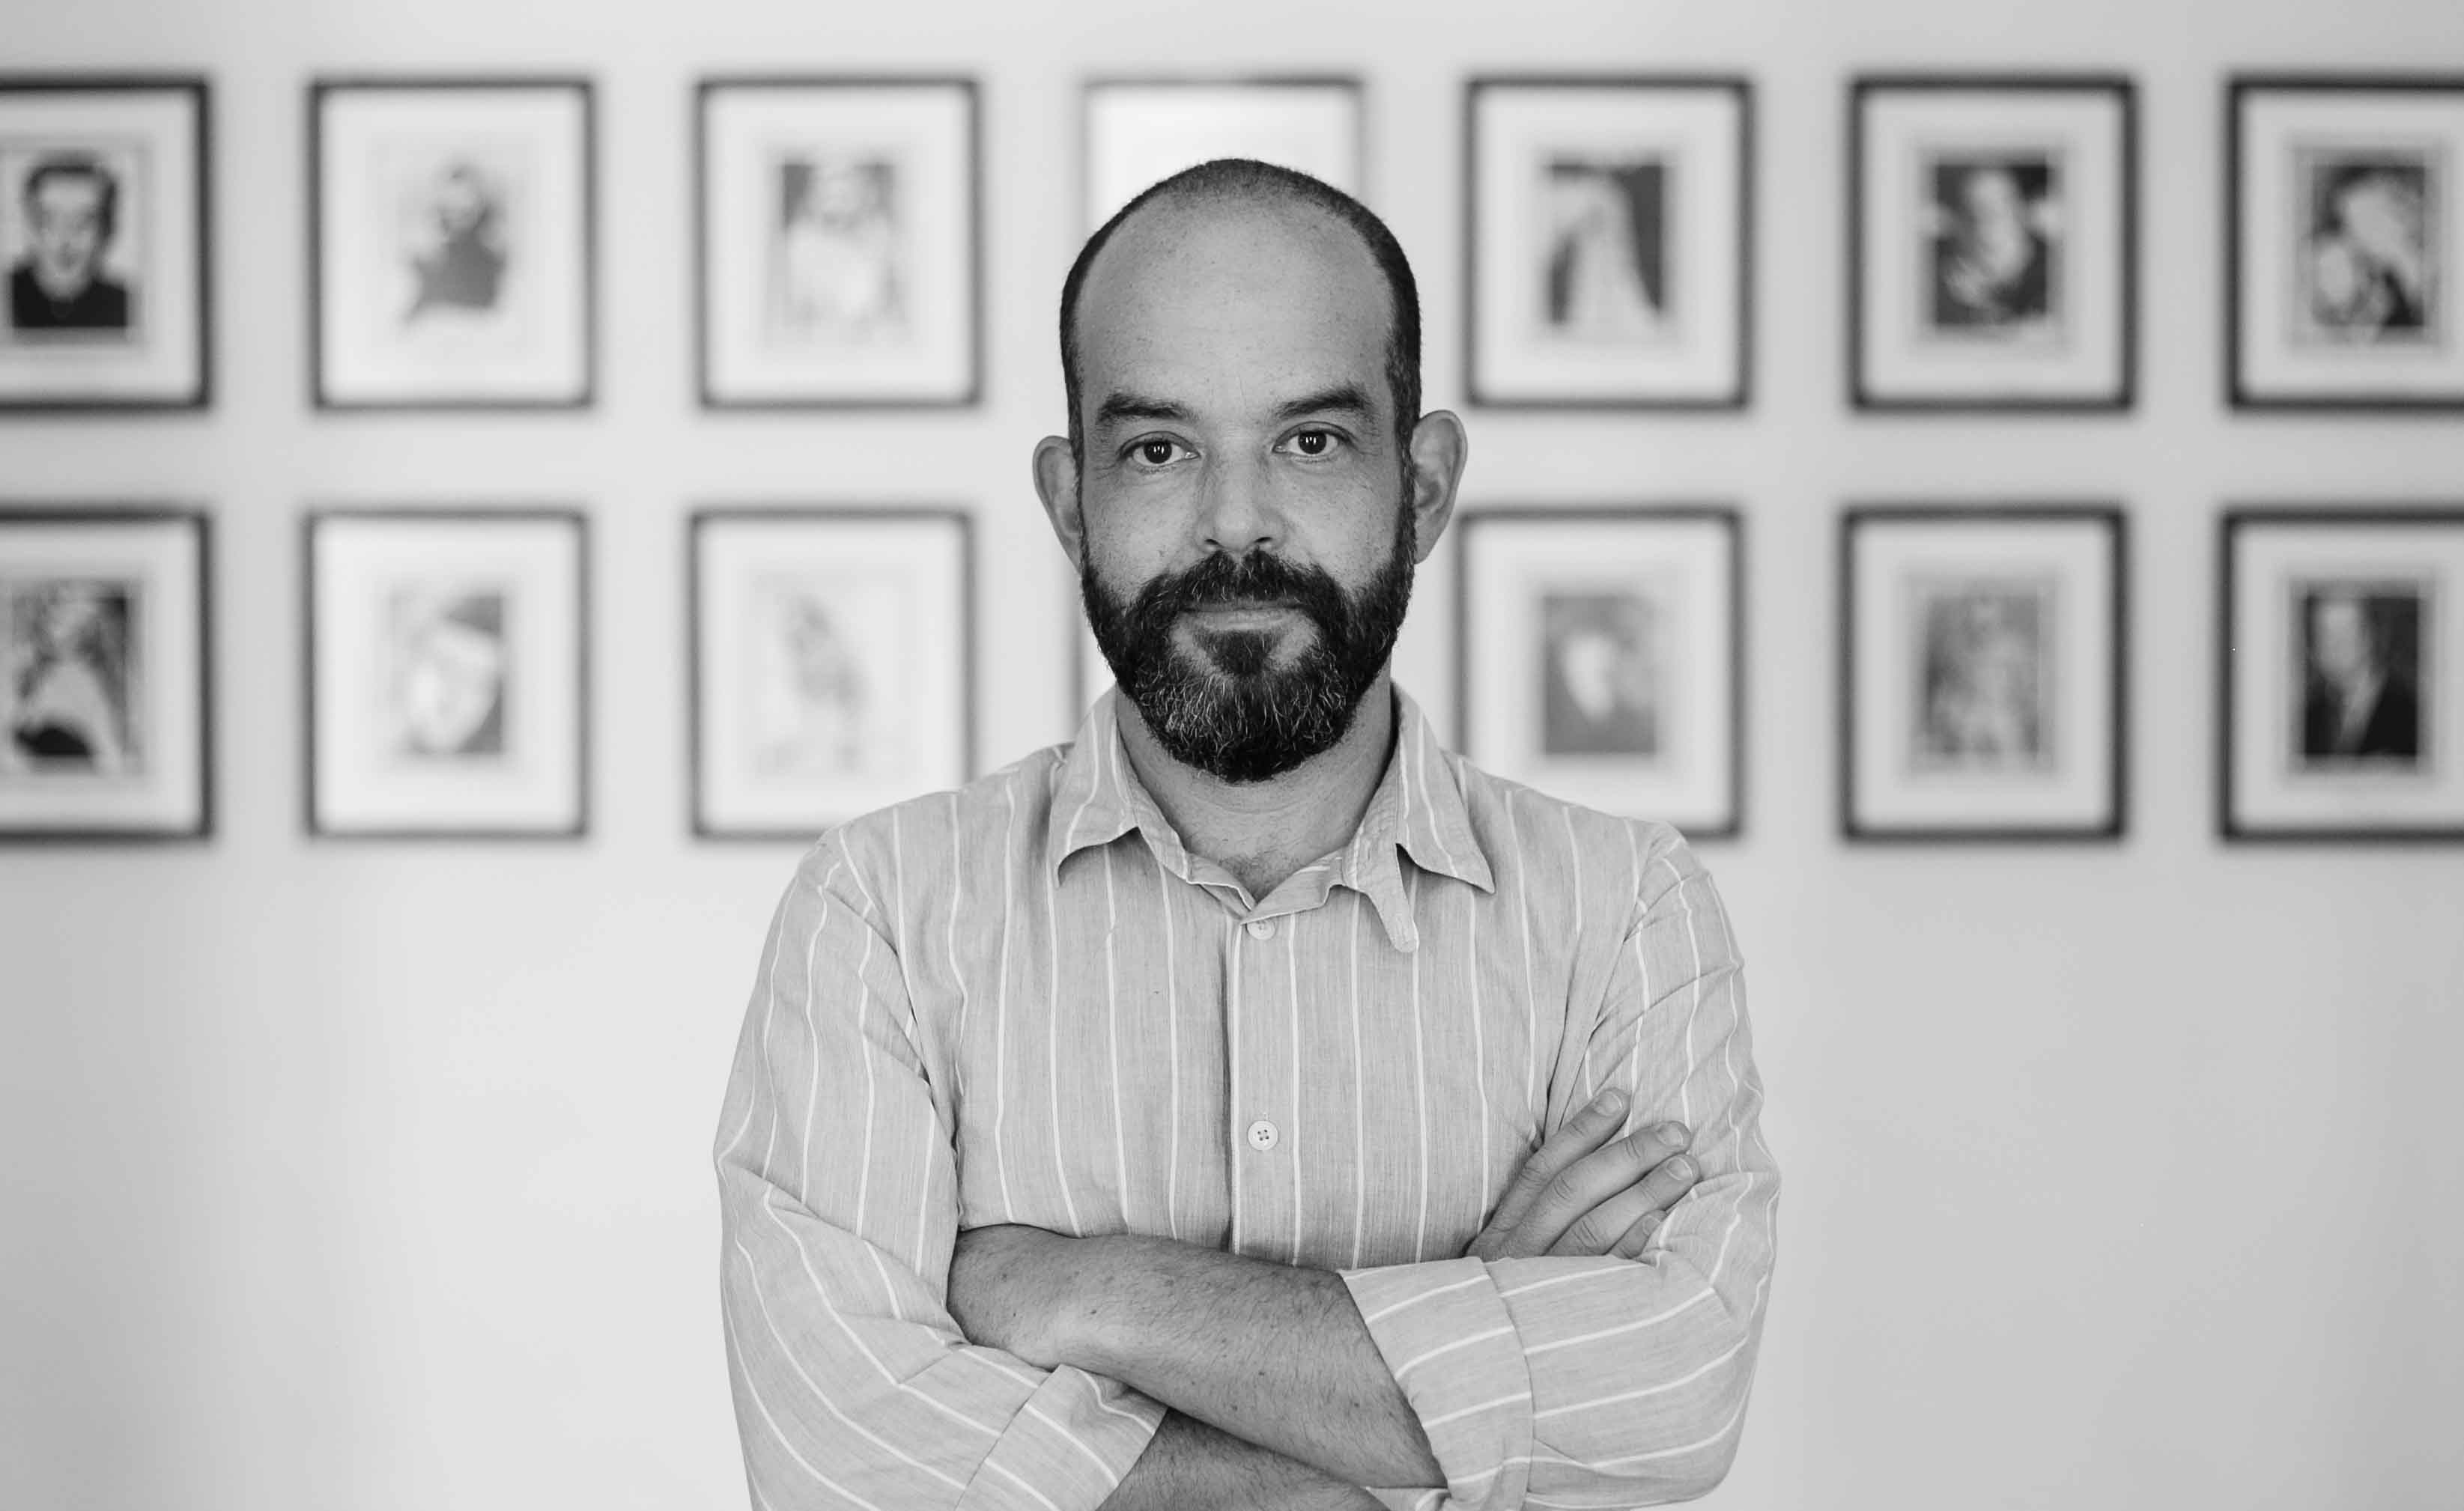 Adriano Goldman